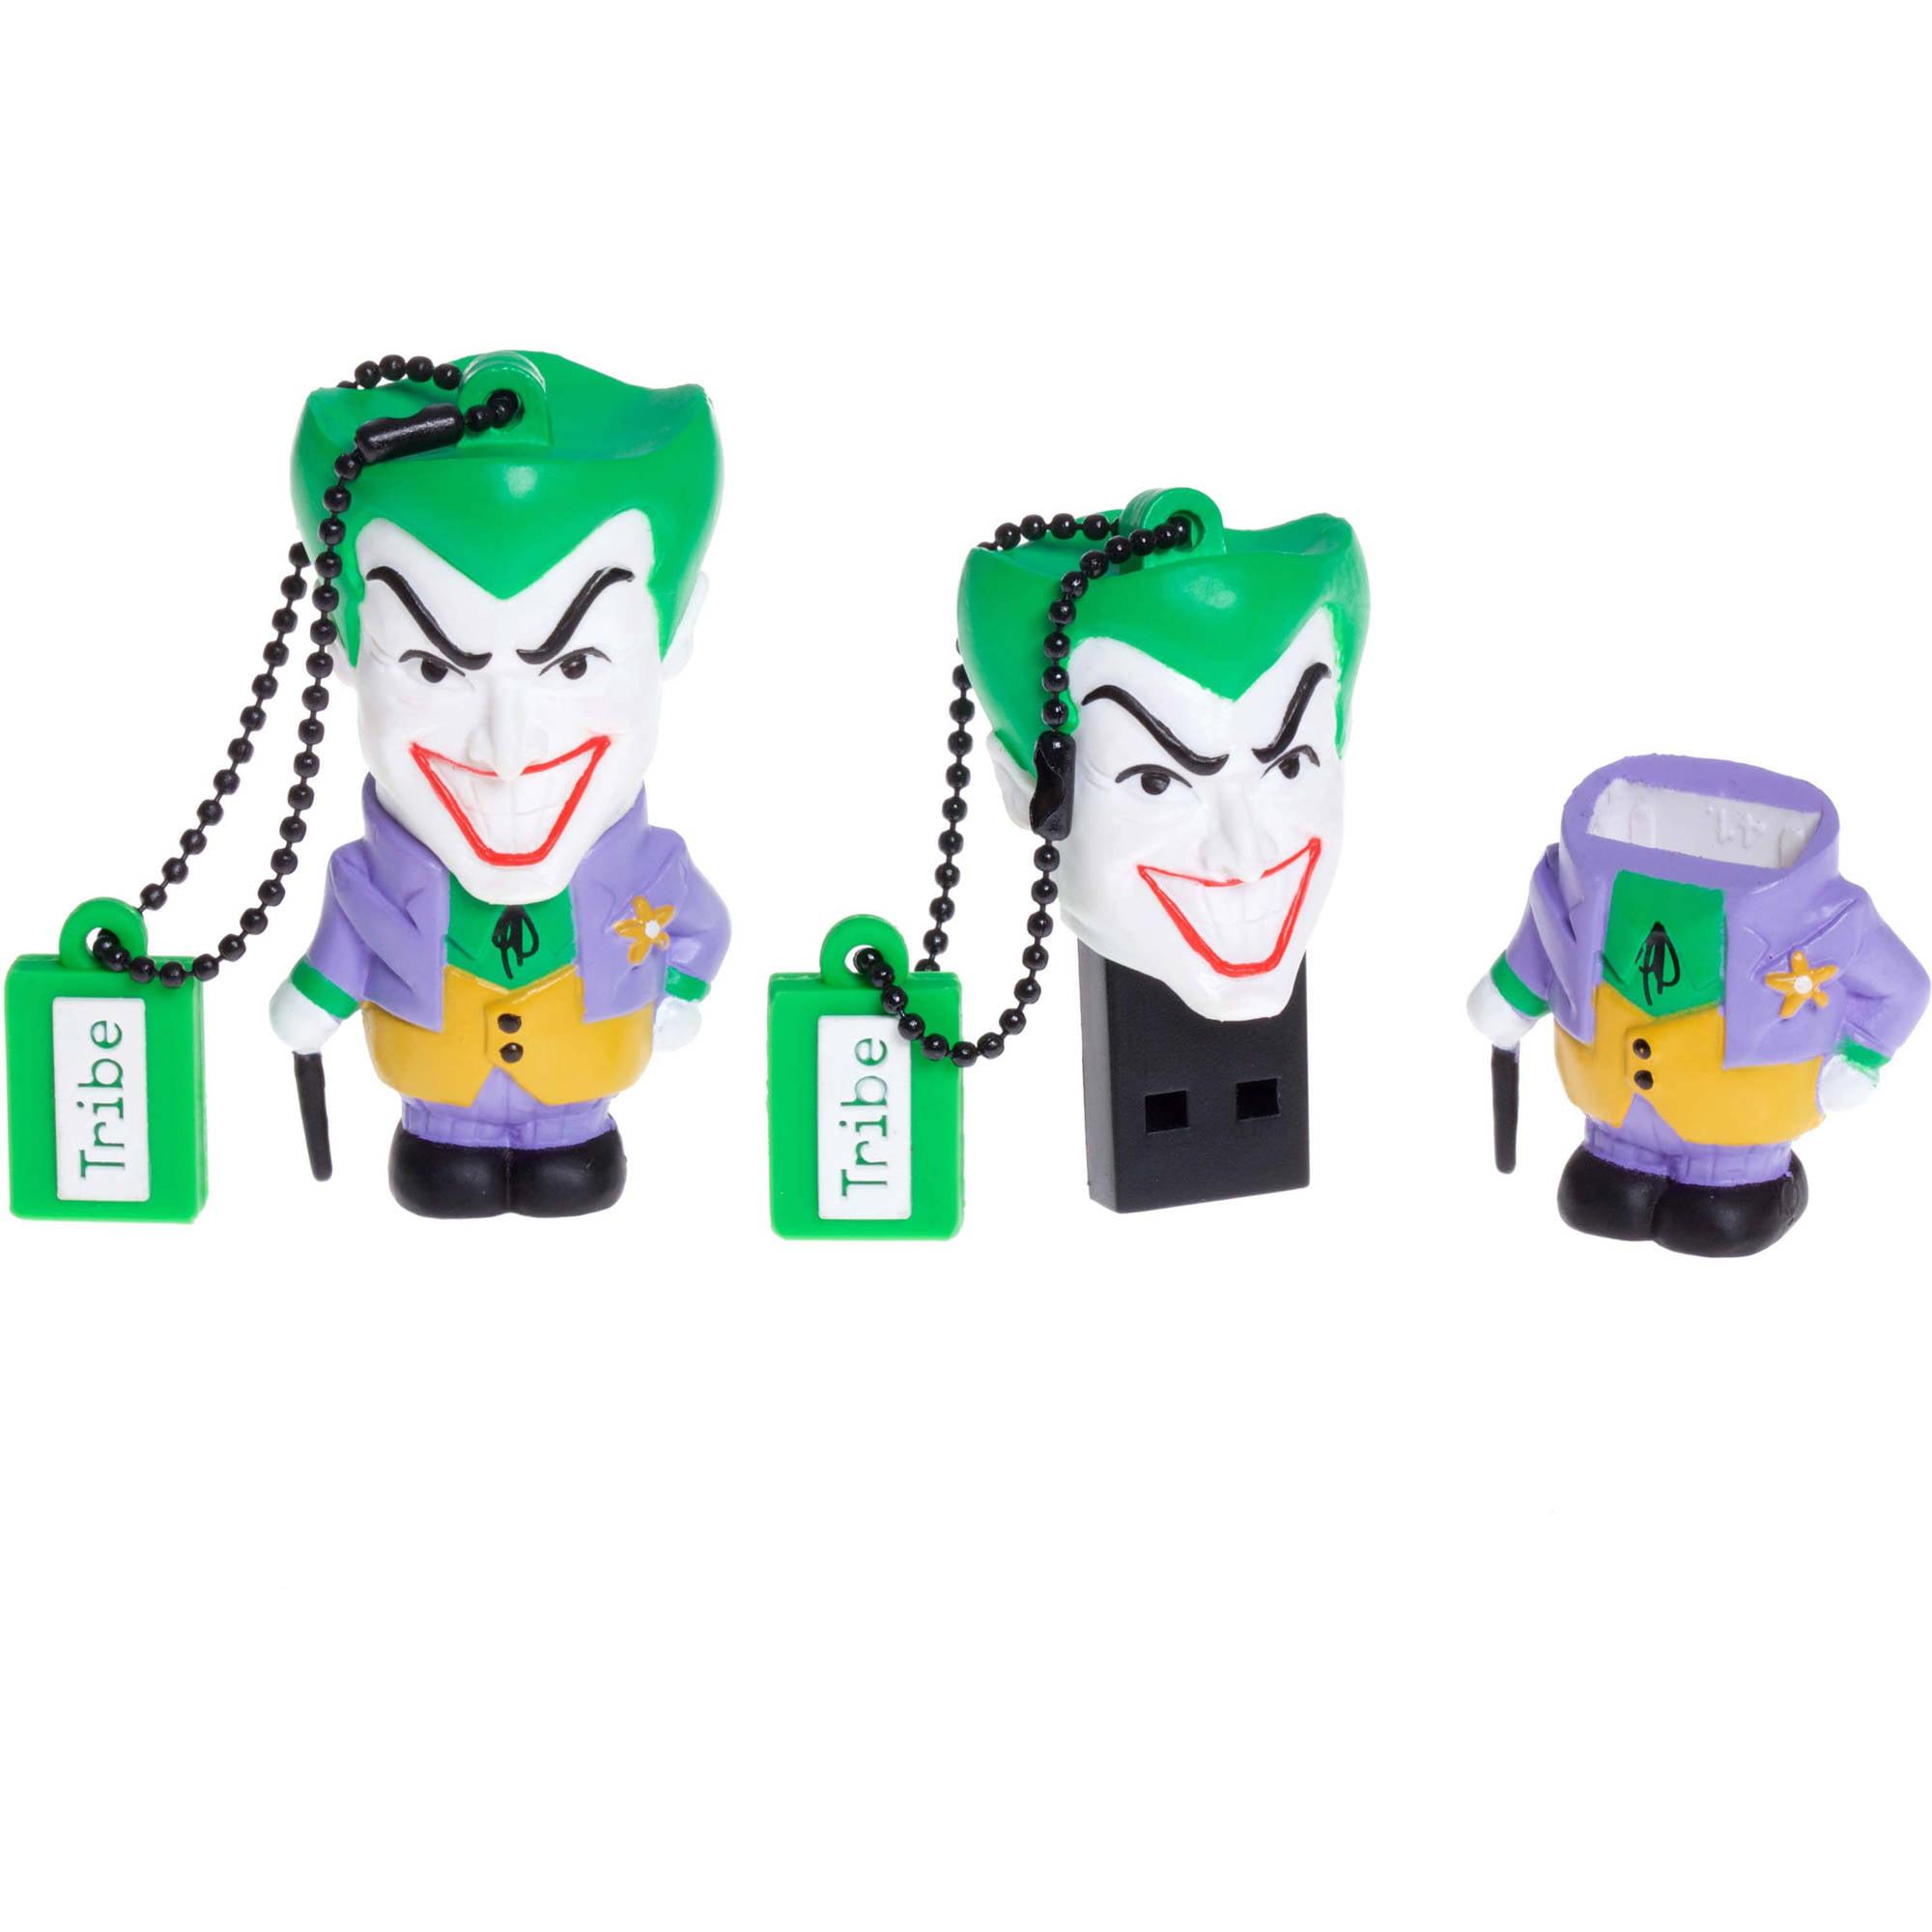 Tribe USB Flash Drive 16GB DC Joker Classic Collectible Figure